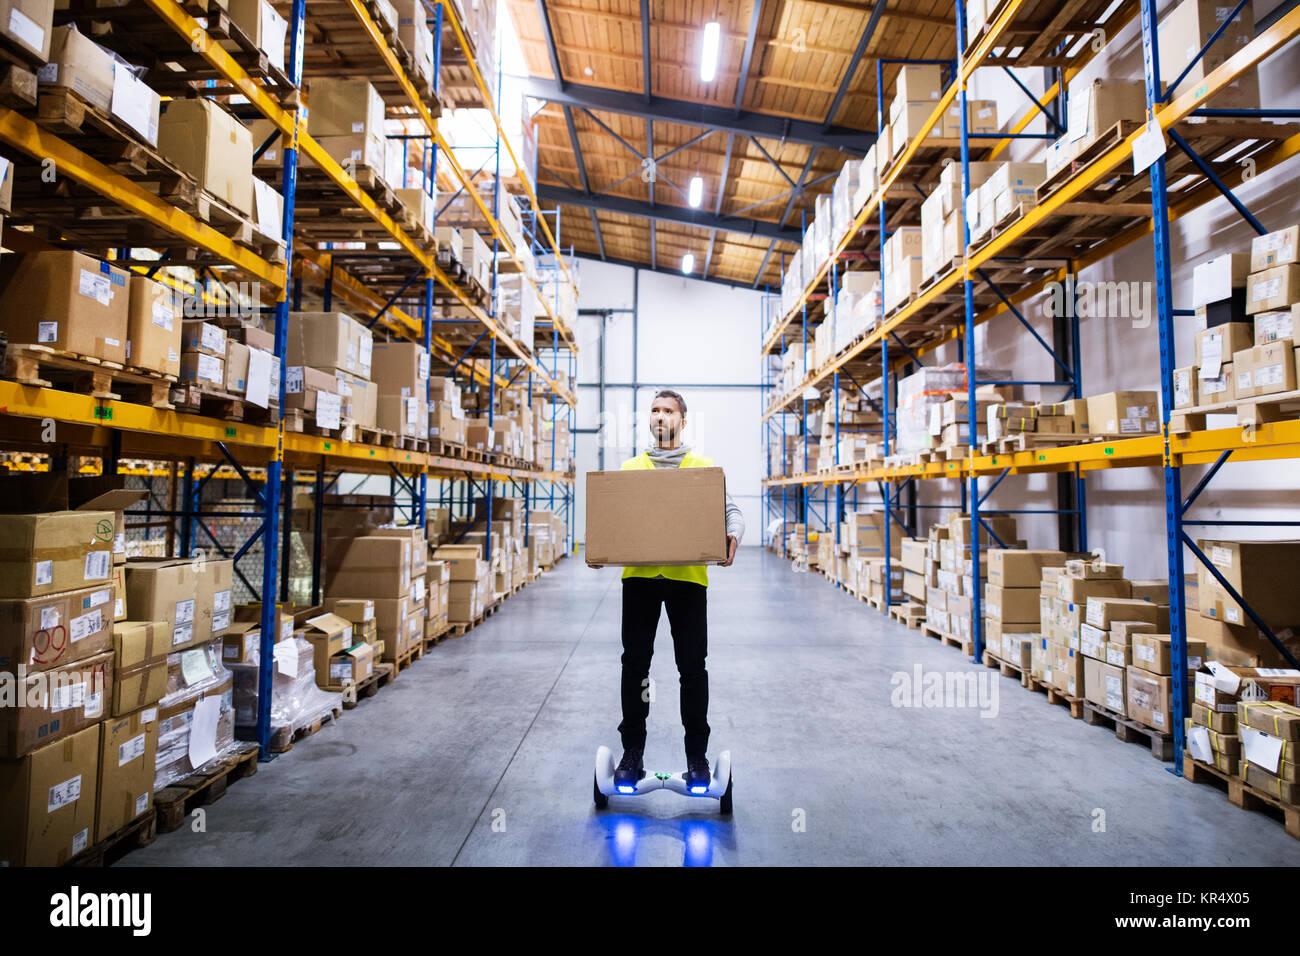 Mini Warehouse Stock Photos Amp Mini Warehouse Stock Images